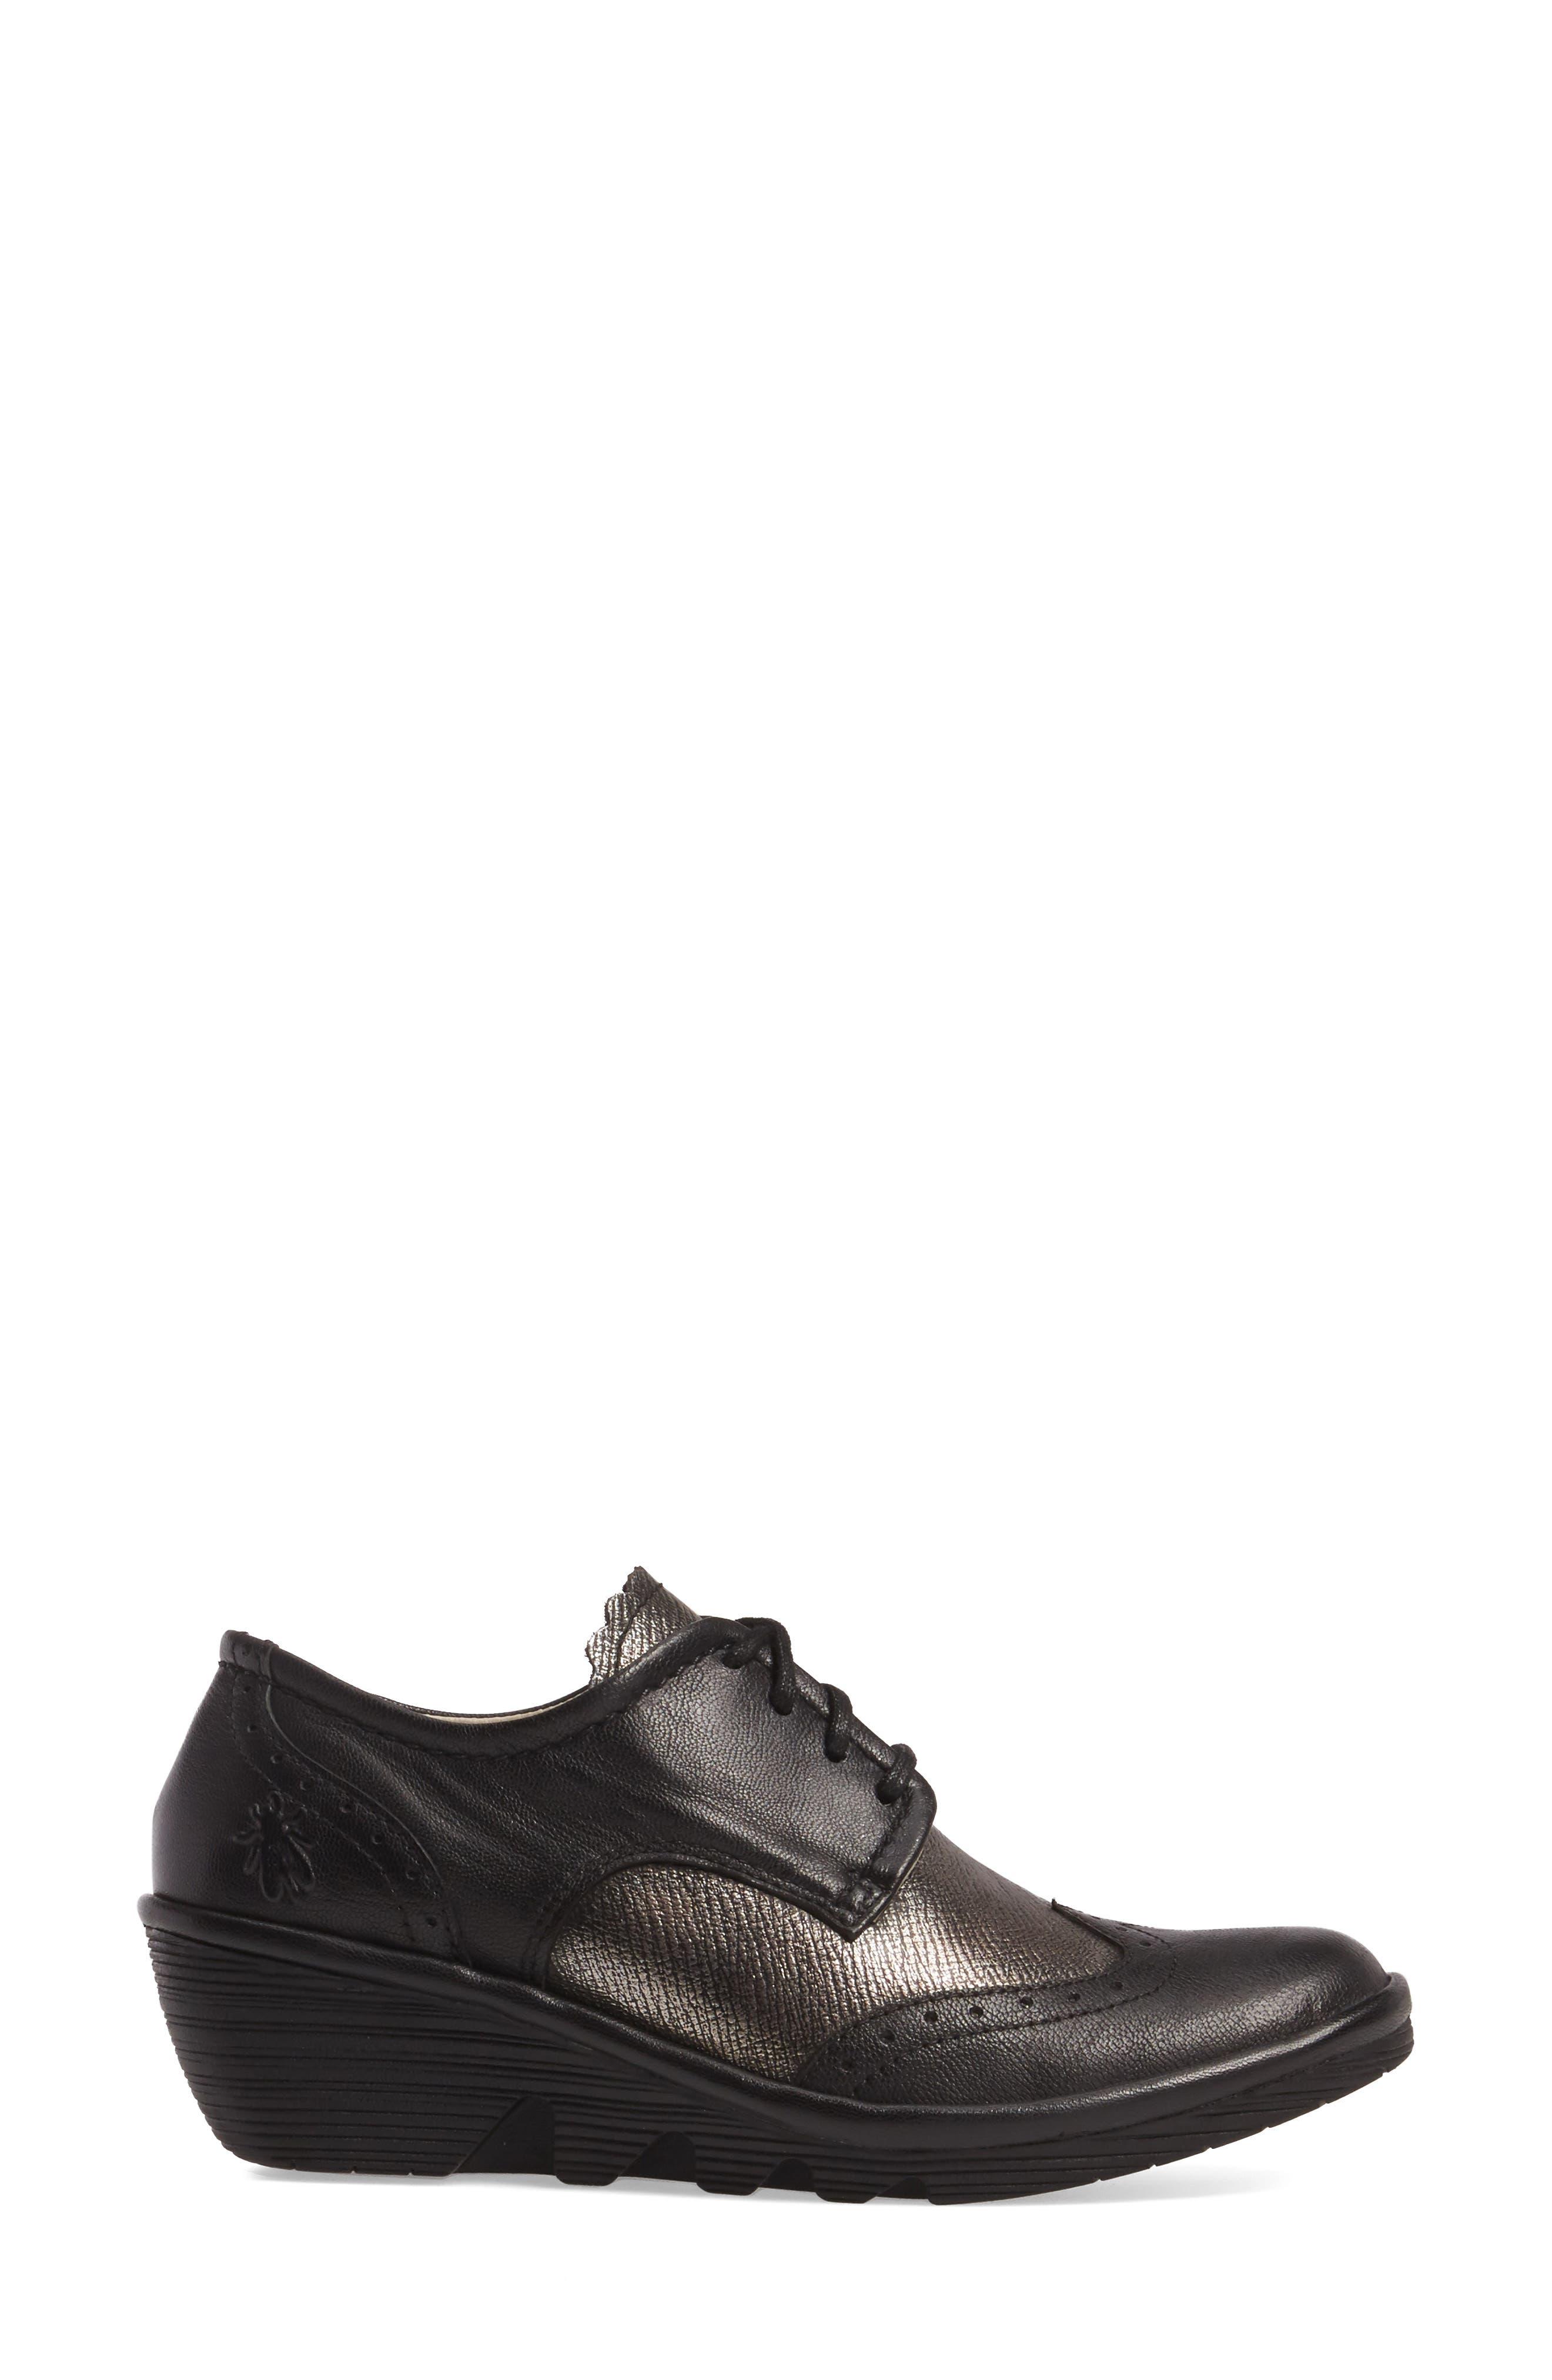 'Palt' WedgePump,                             Alternate thumbnail 3, color,                             Black/ Antique Silver Leather